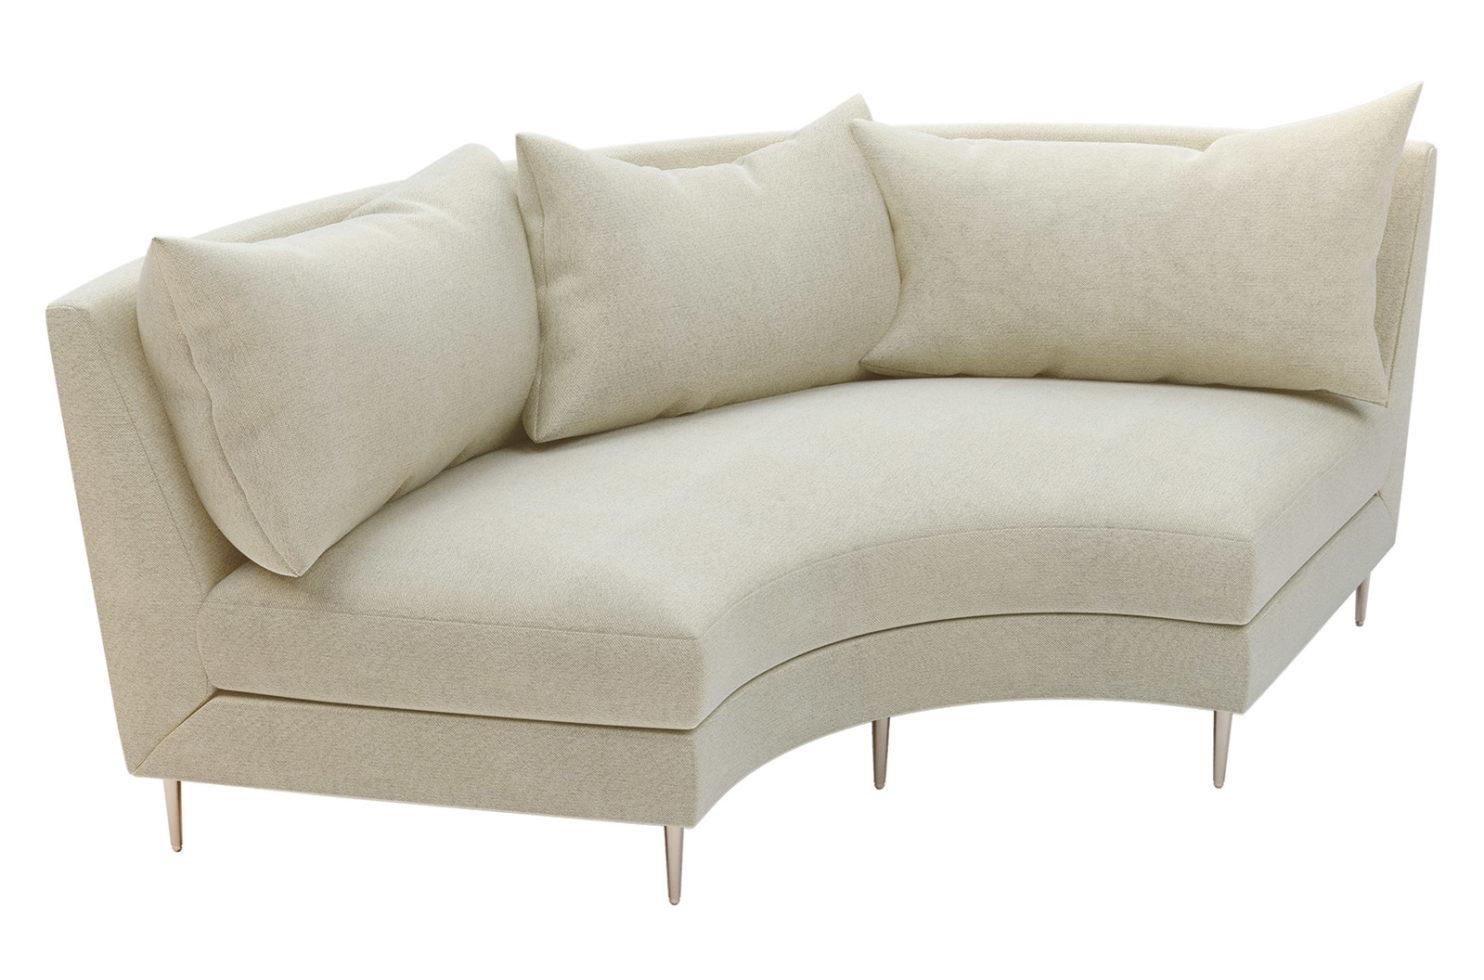 fizz mimosa armless sofa 105FT003P2 AS